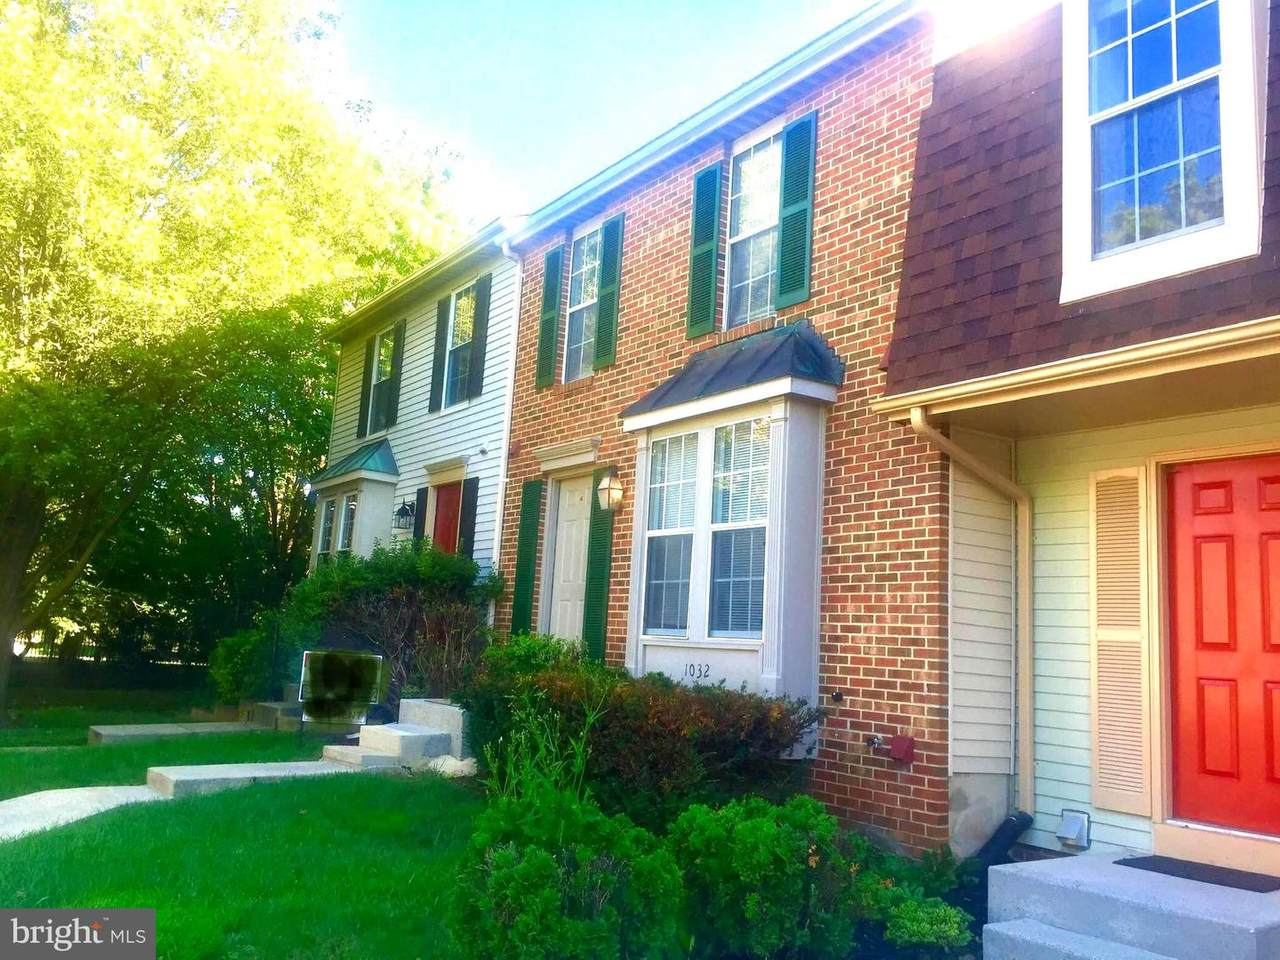 1032 Bayridge Terrace - Photo 1